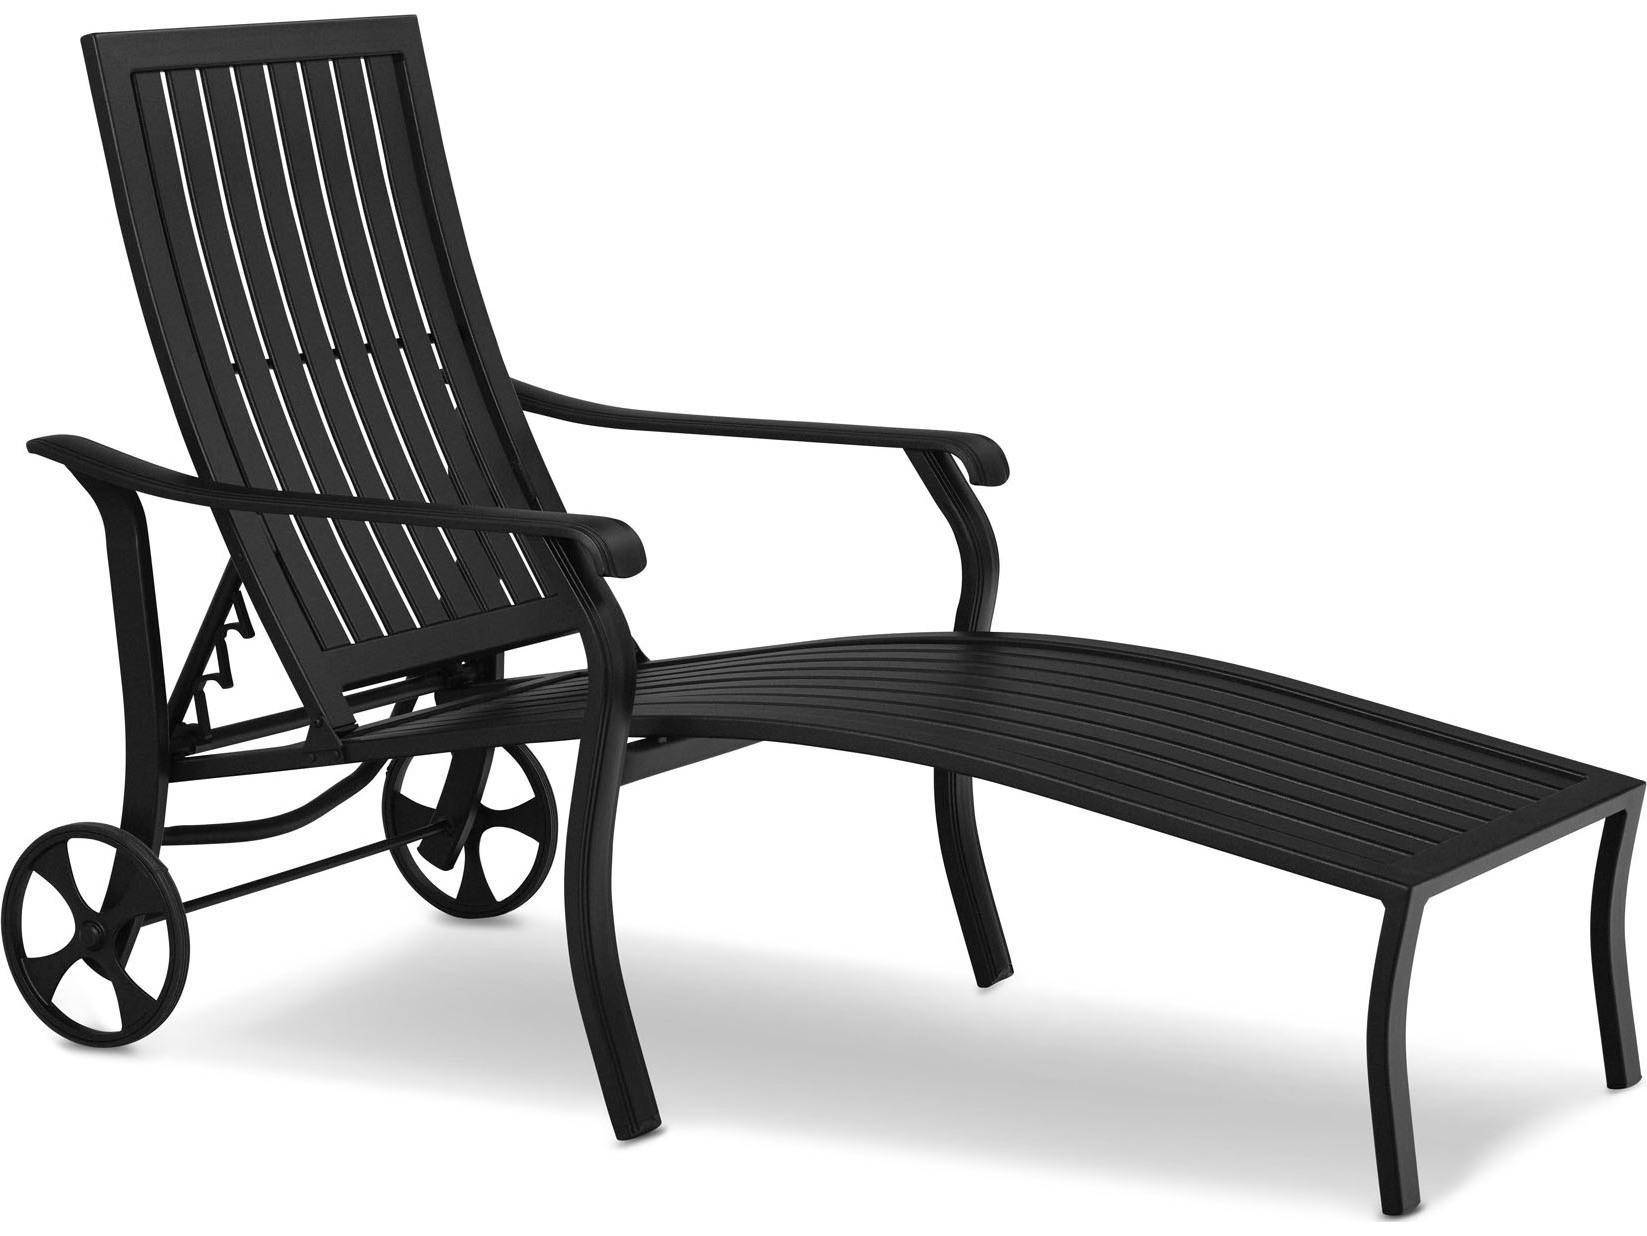 Telescope casual ocala cast aluminum coordinate arm chaise for Cast aluminum chaise lounge with wheels